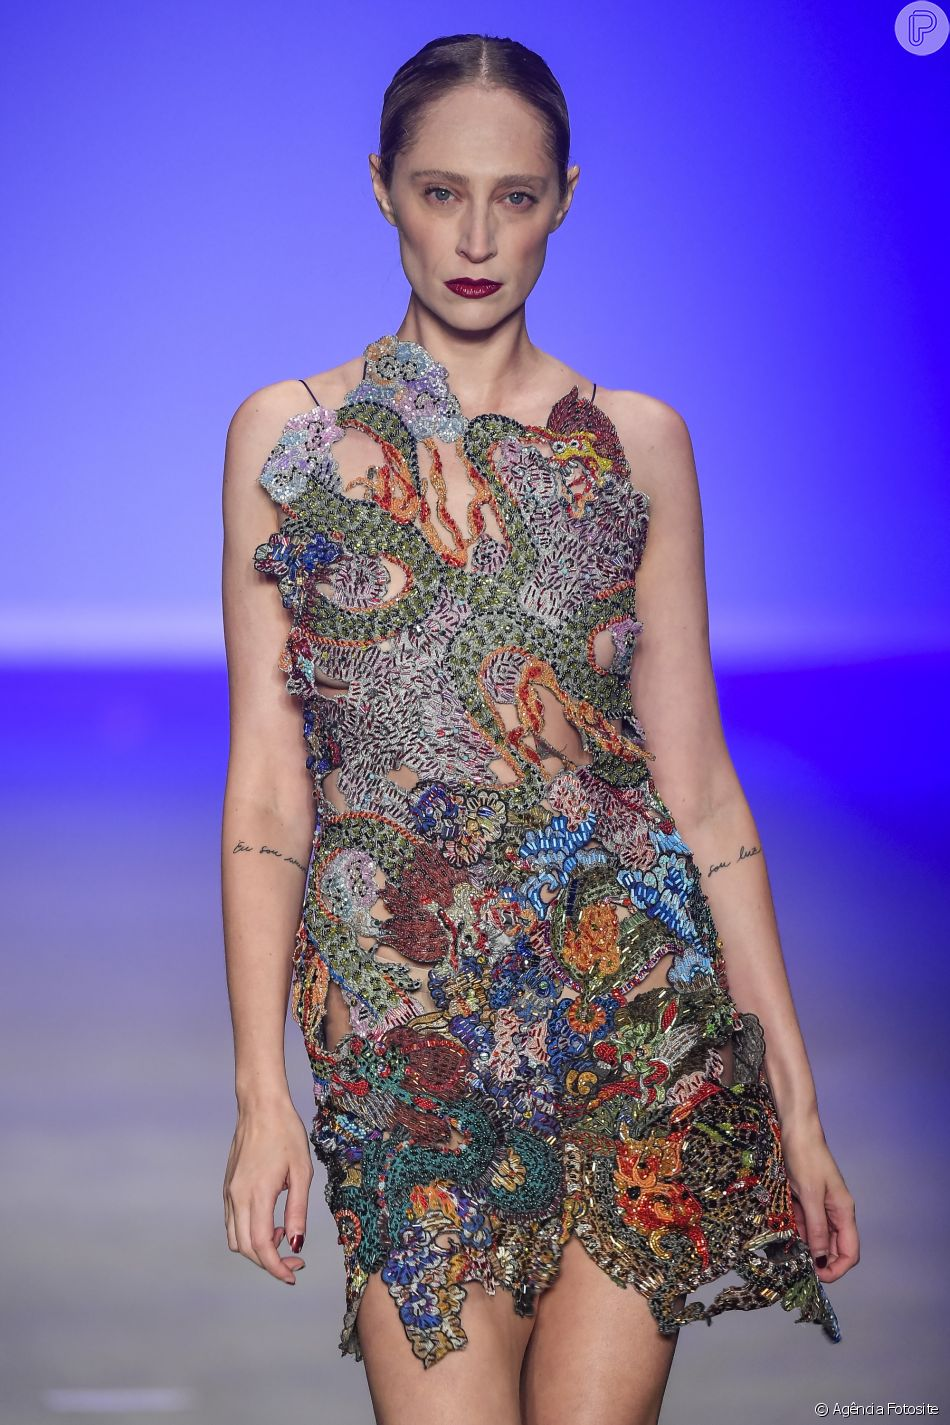 Estampas que foram sucesso no São Paulo Fashion Week: riqueza de detalhes no look Lino Villaventura